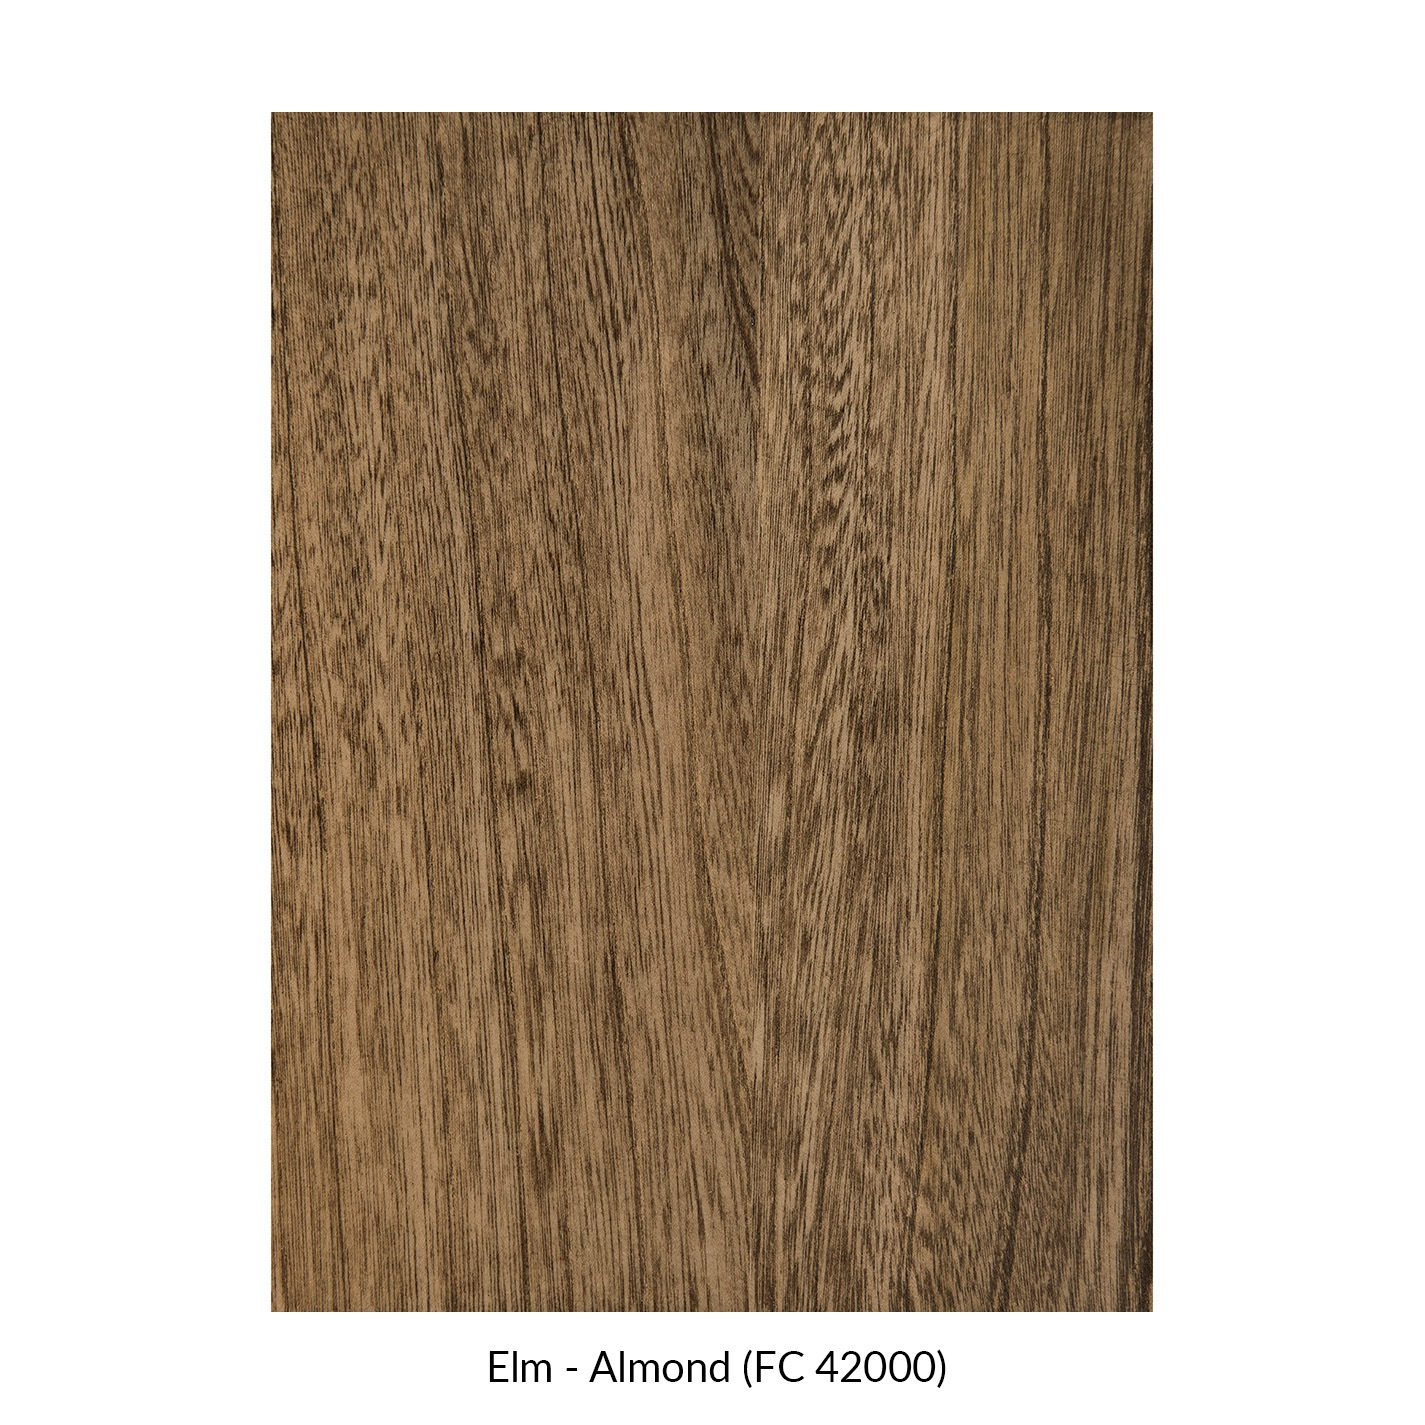 spectrum-elm-almond-fc-42000.jpg